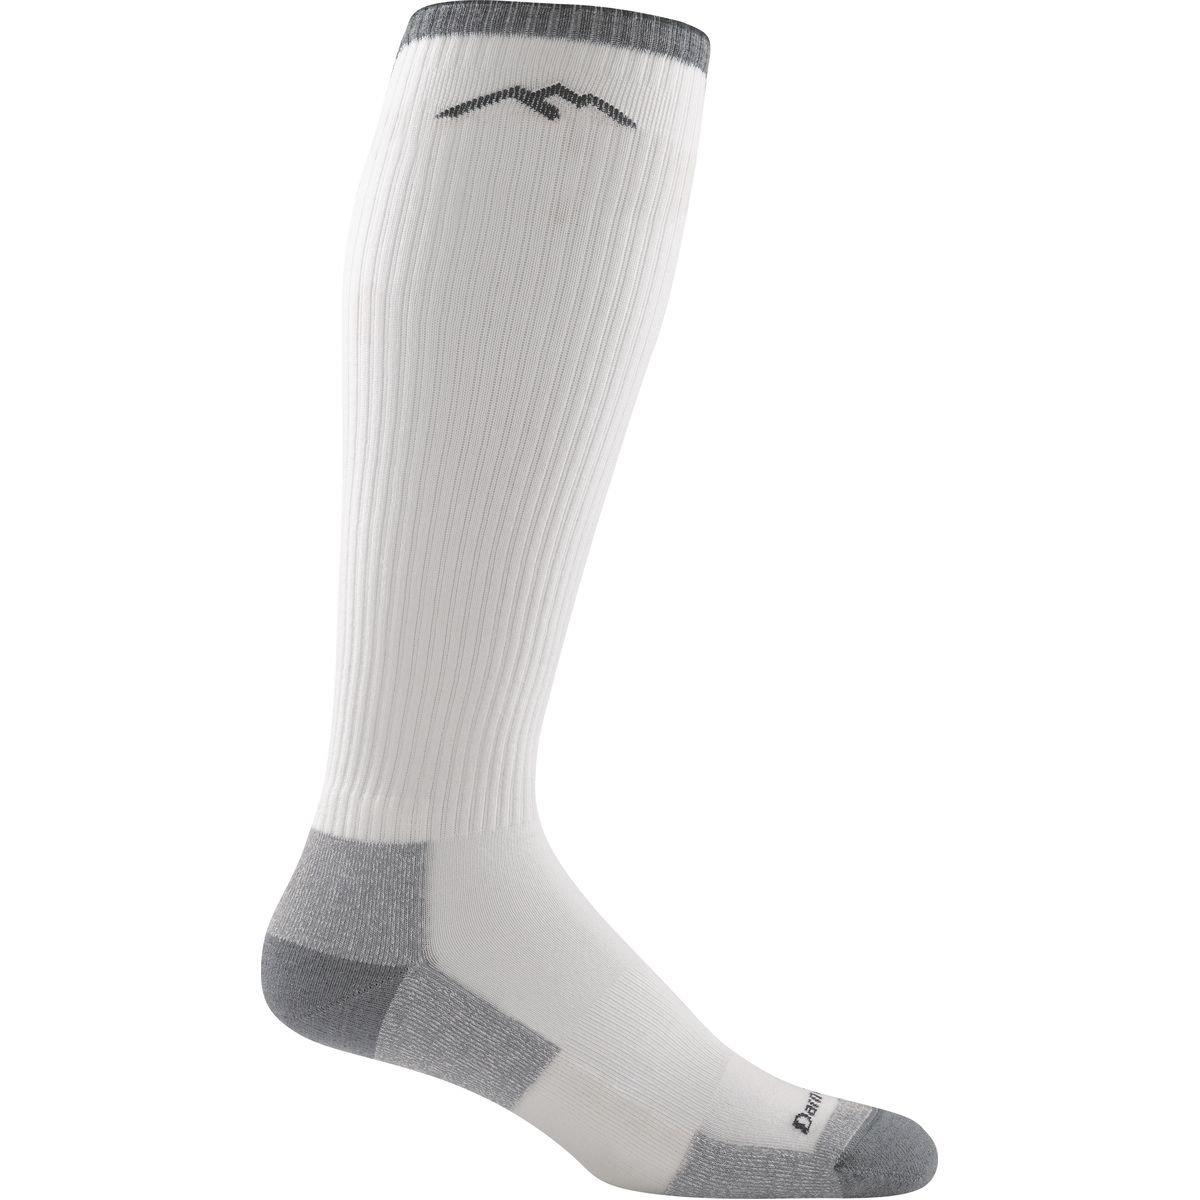 Darn tough Men's Westerner Over-the-Calf Light Cushion Socks